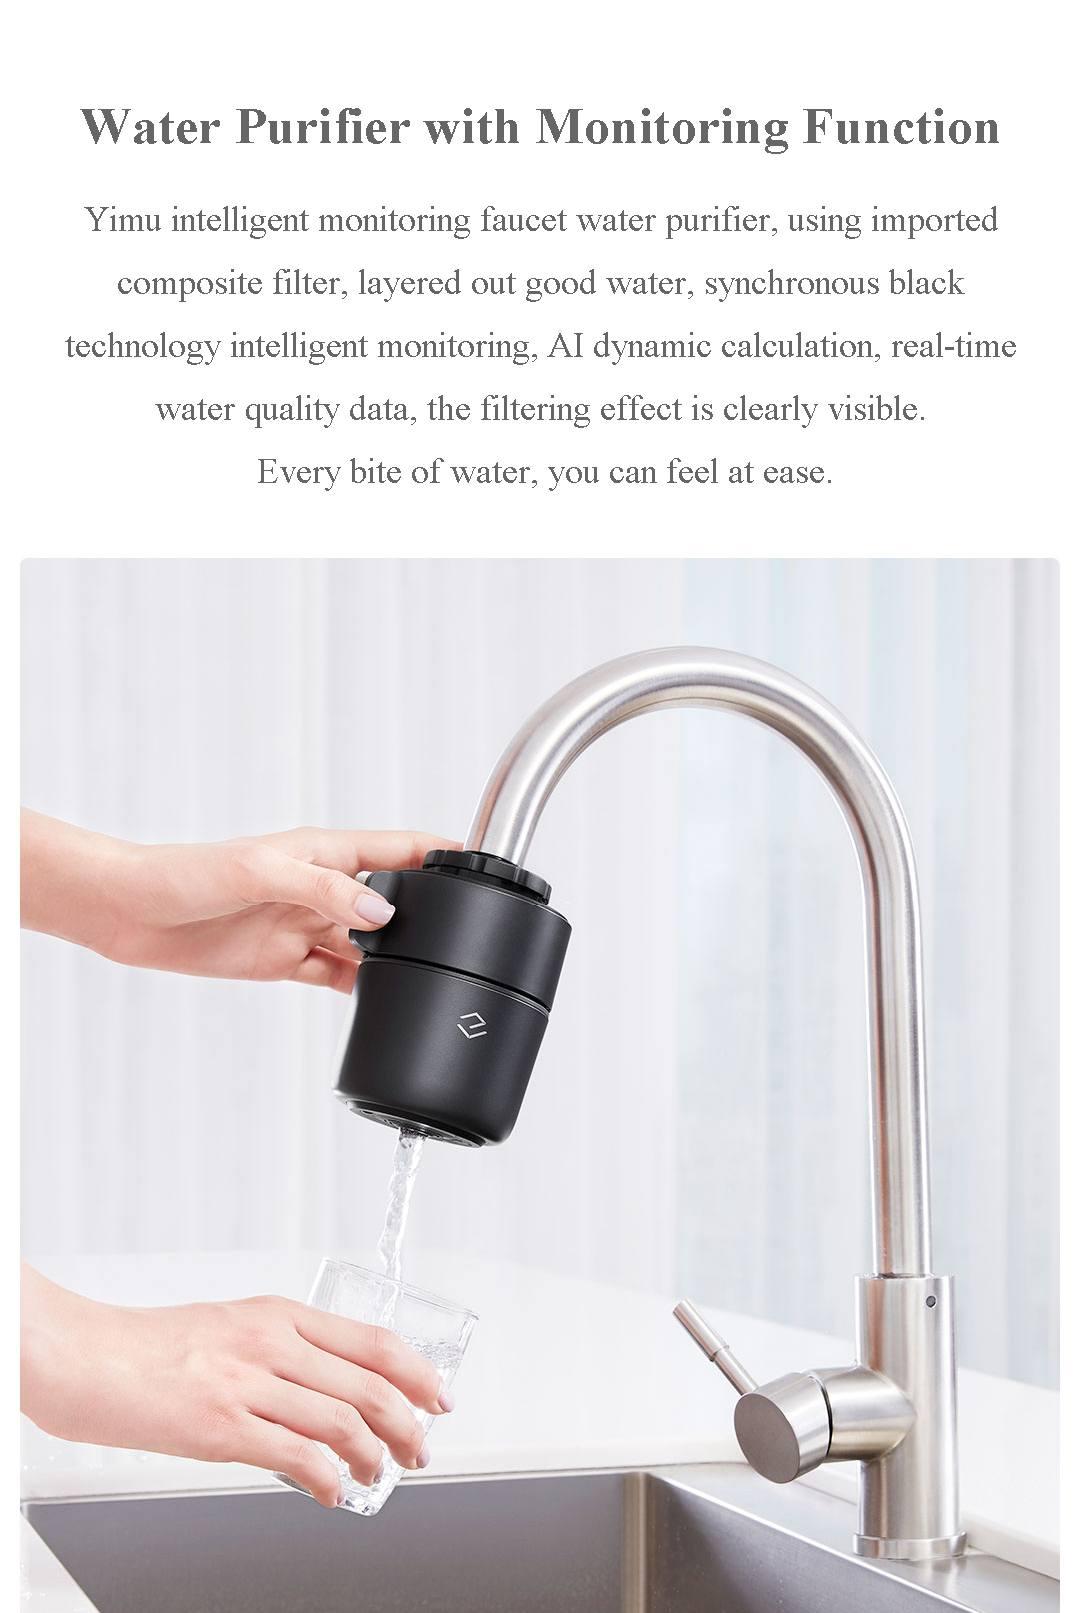 Ecomo Yimu Smart APP Monitoring Water